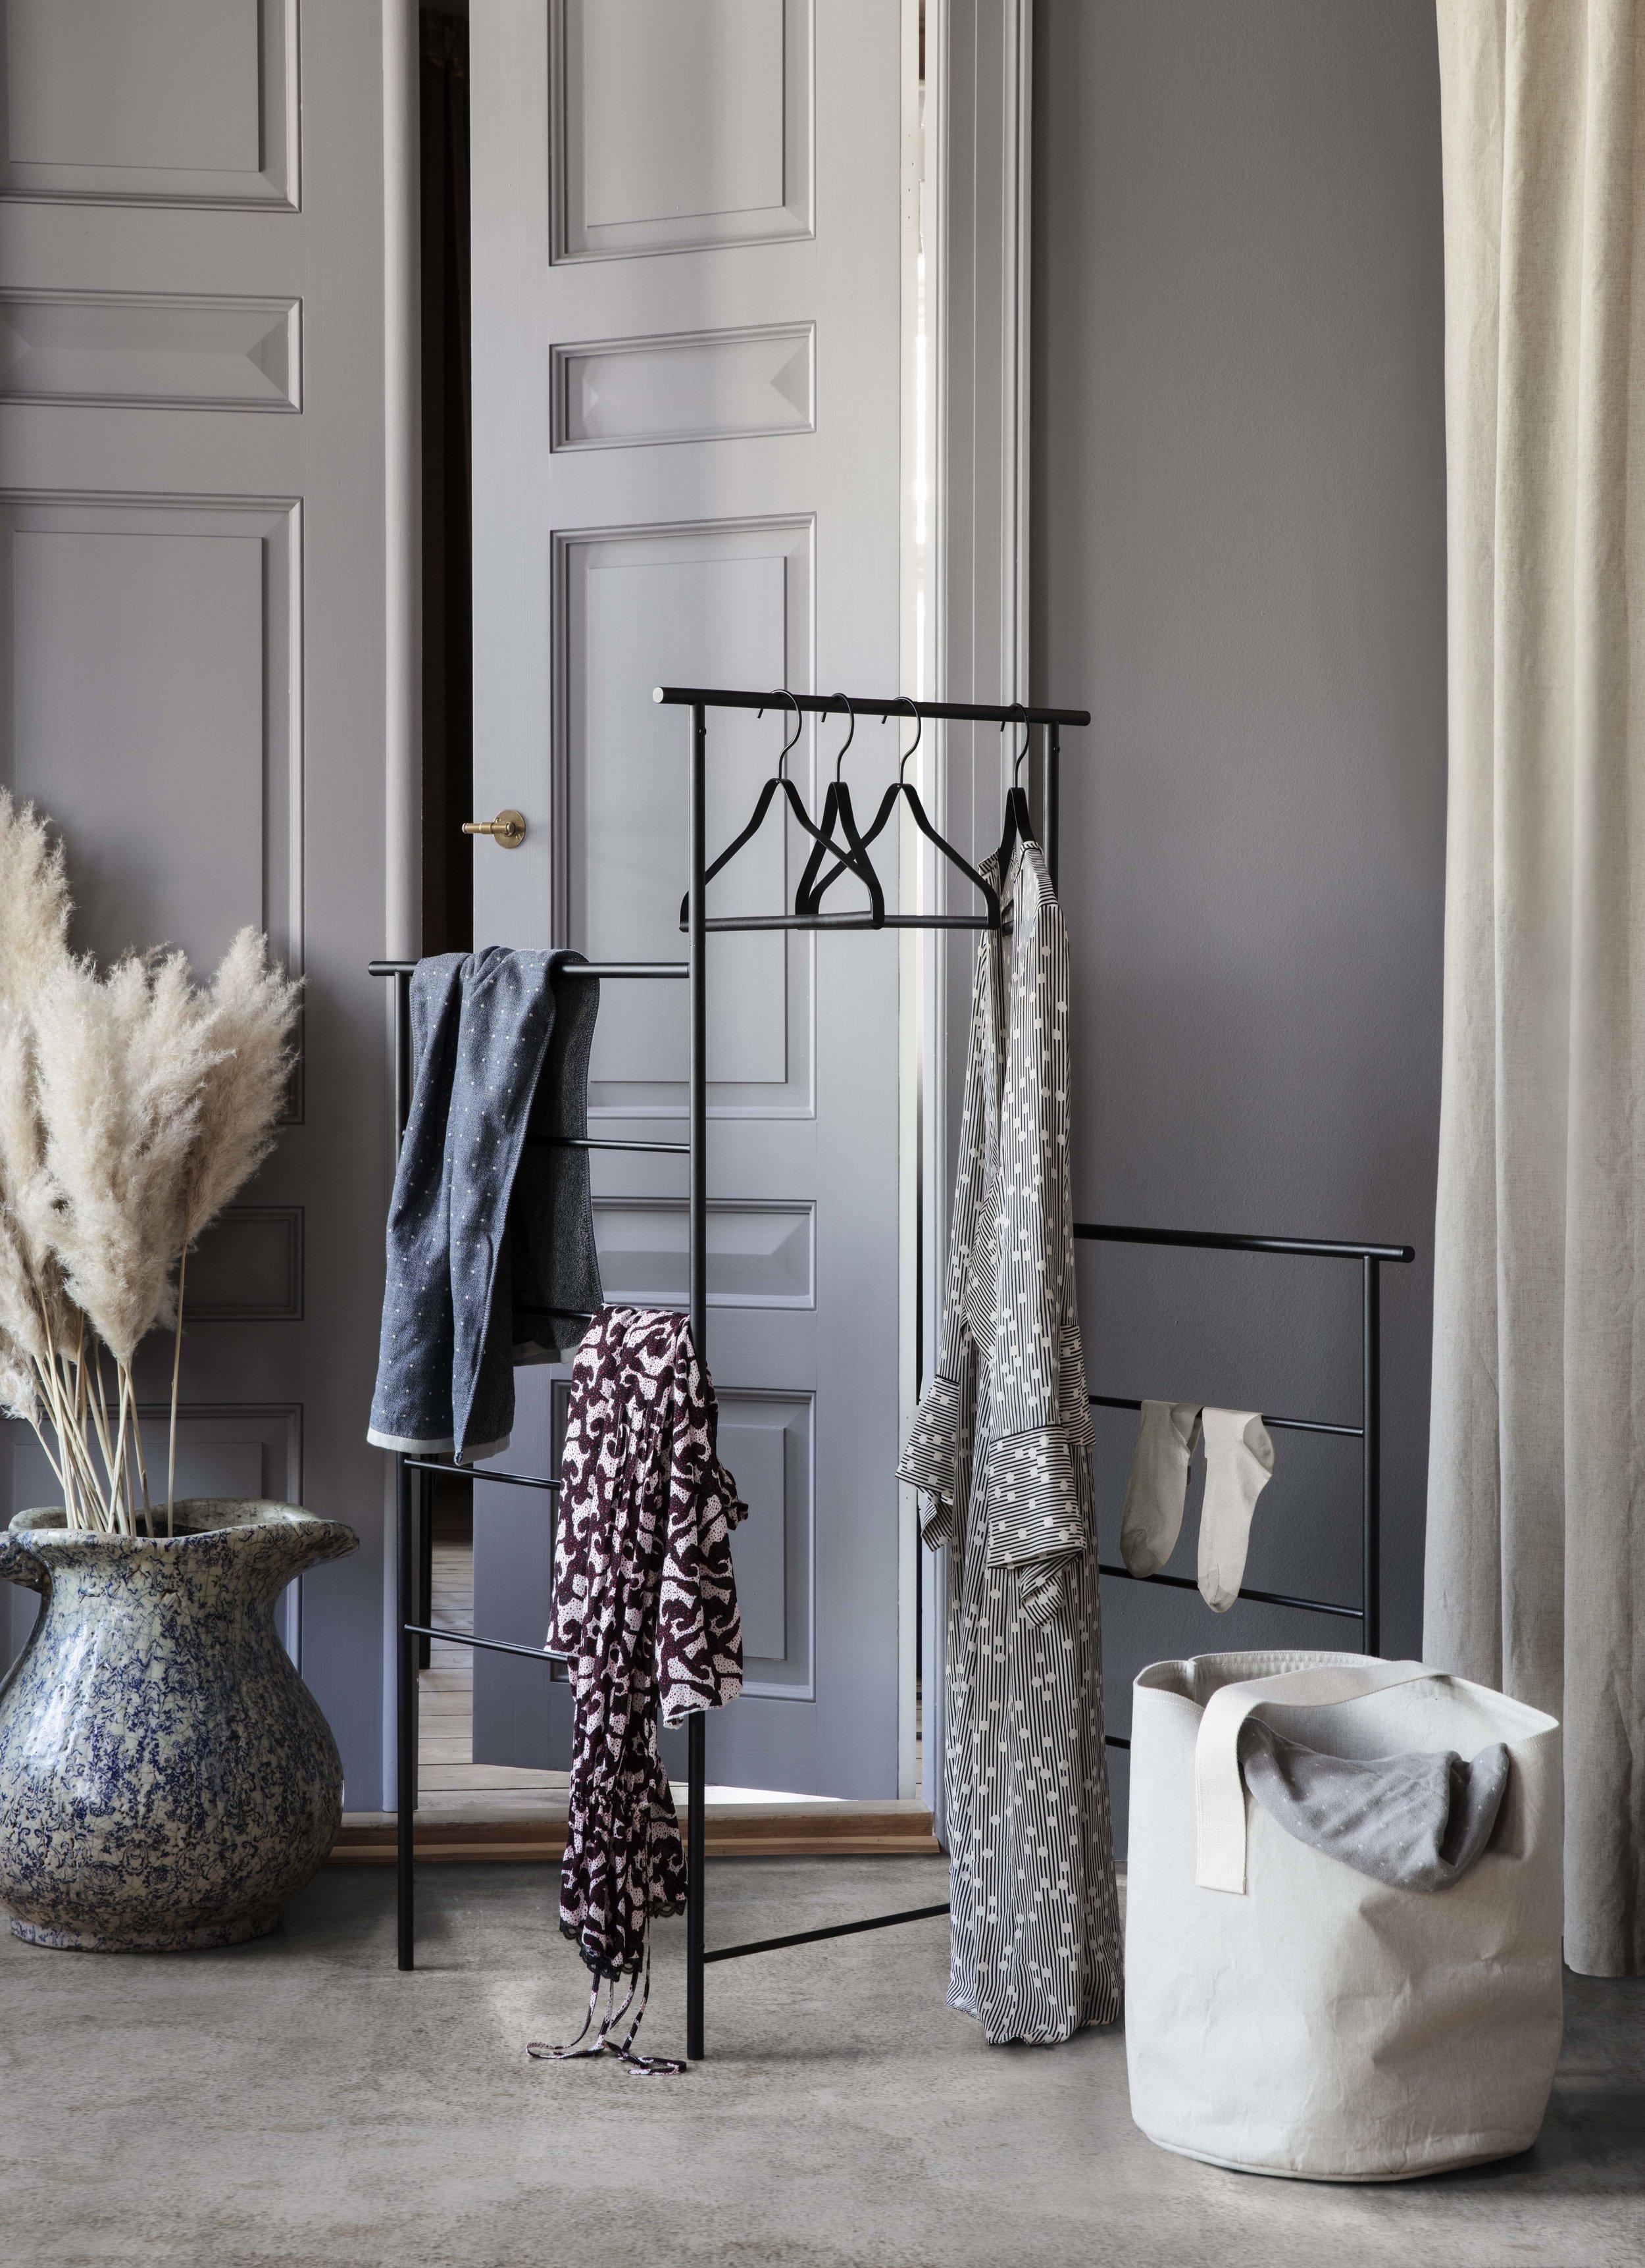 Dora cloths Stand Ferm Living, bathroom essentials.jpg